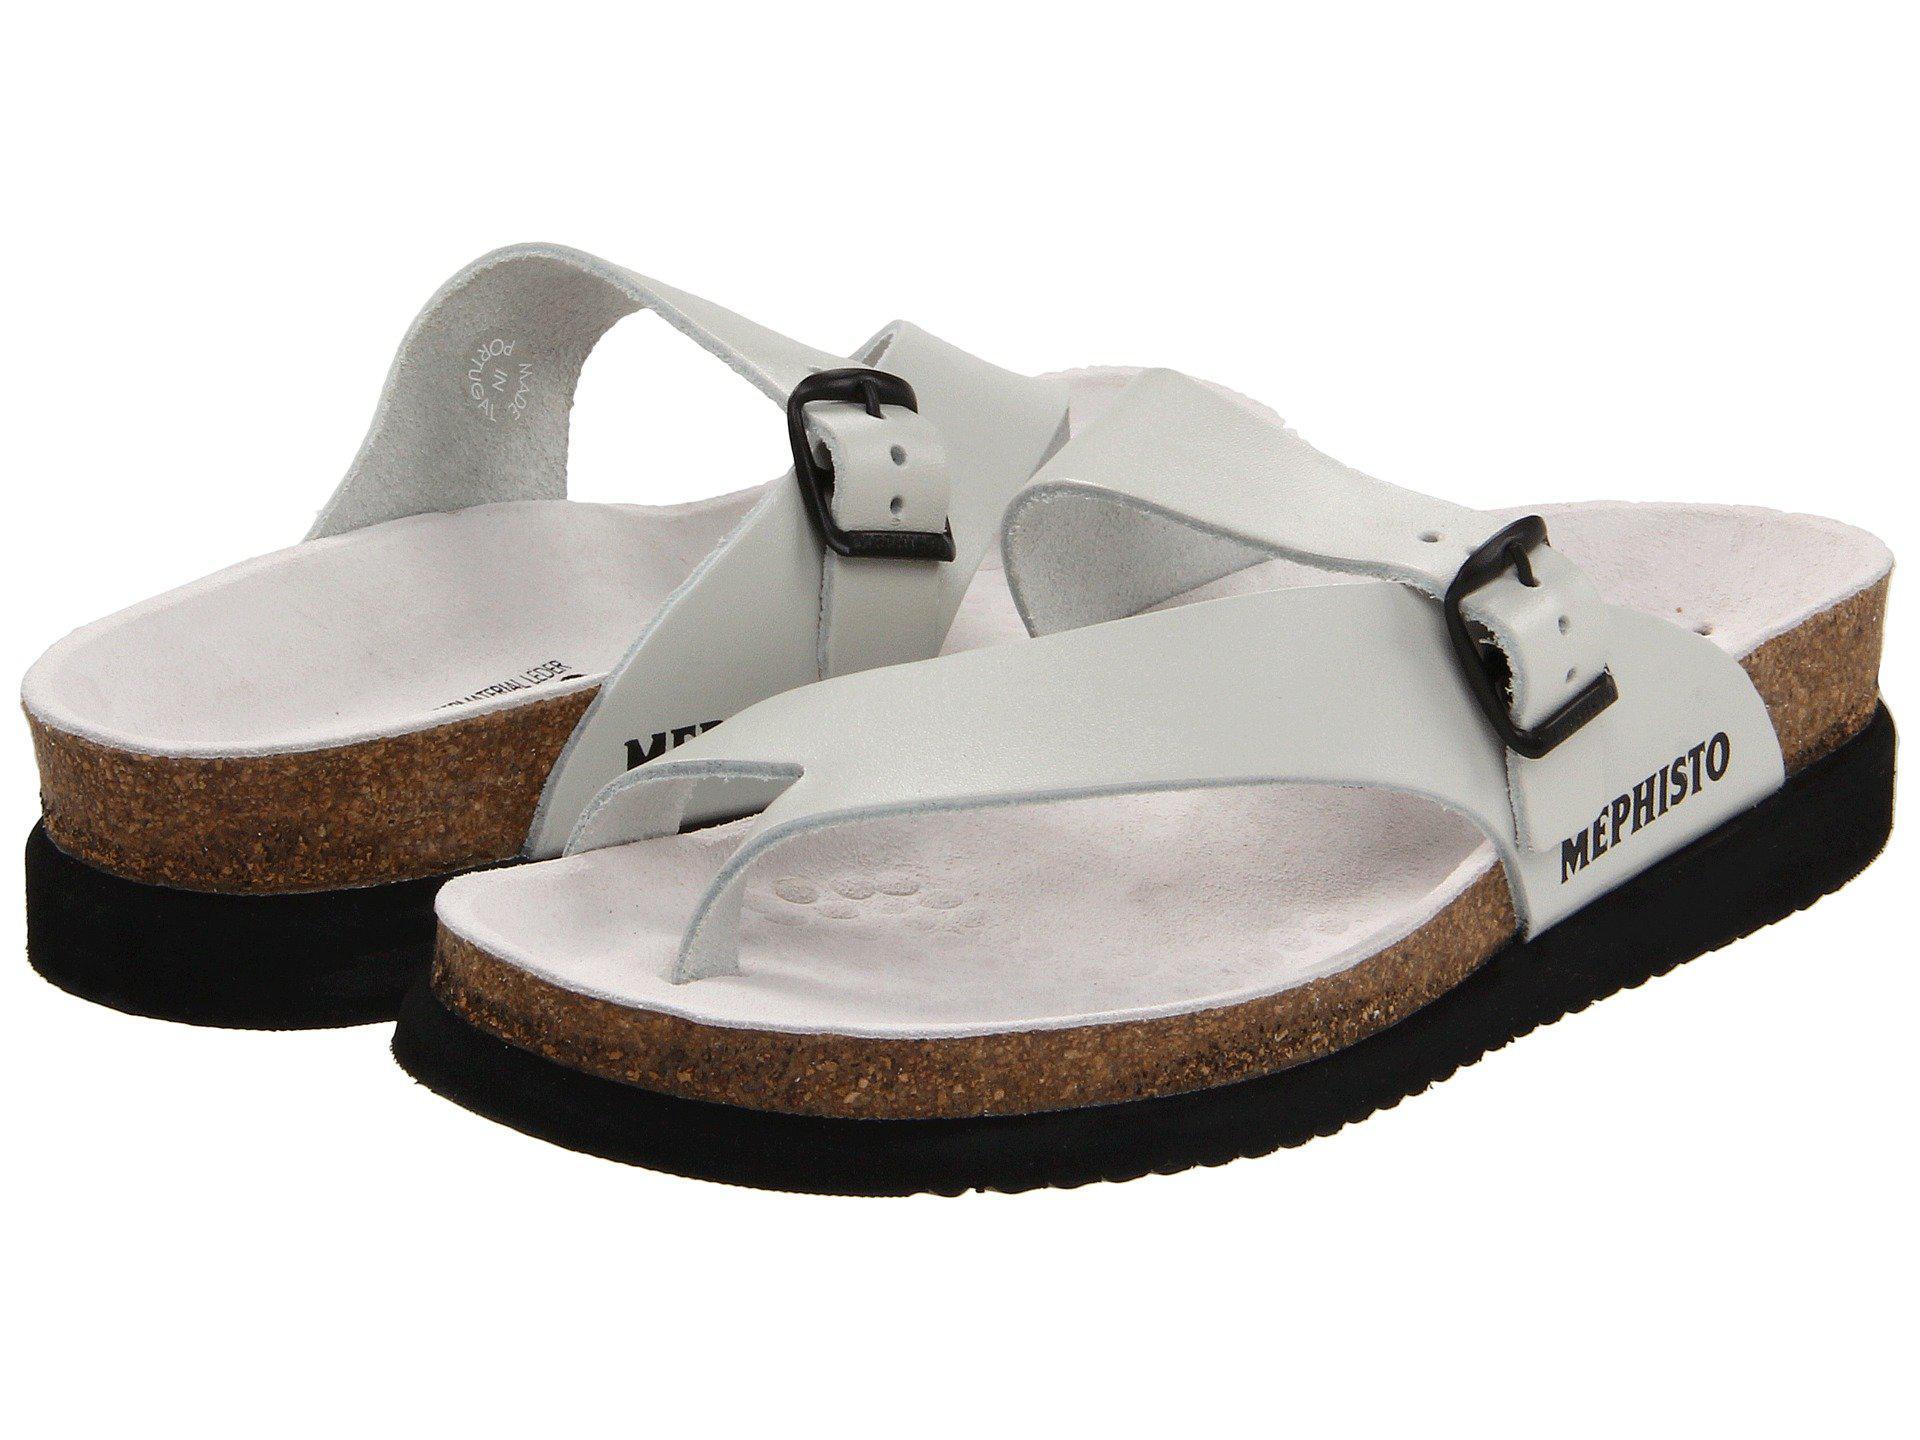 9790e703973c Lyst - Mephisto Helen (black Patent) Women s Sandals in White - Save 1%